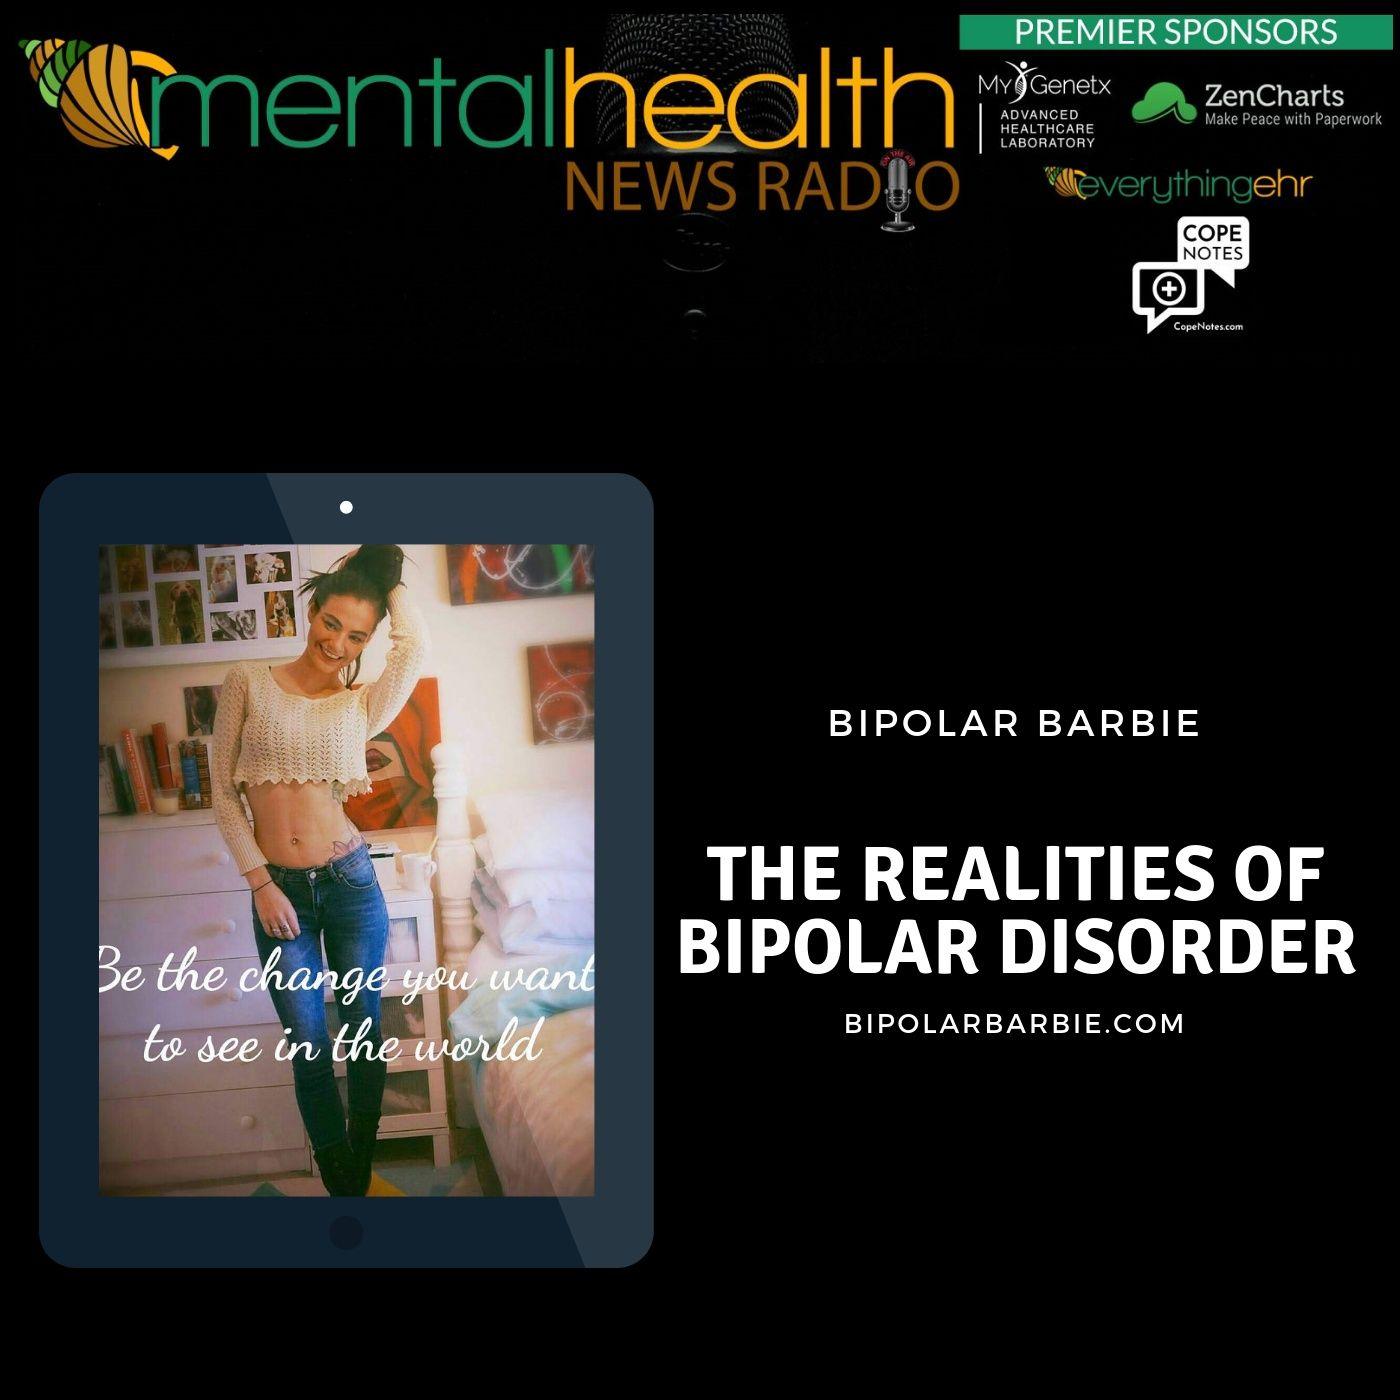 Mental Health News Radio - The Realities of Bipolar Disorder with Bipolar Barbie